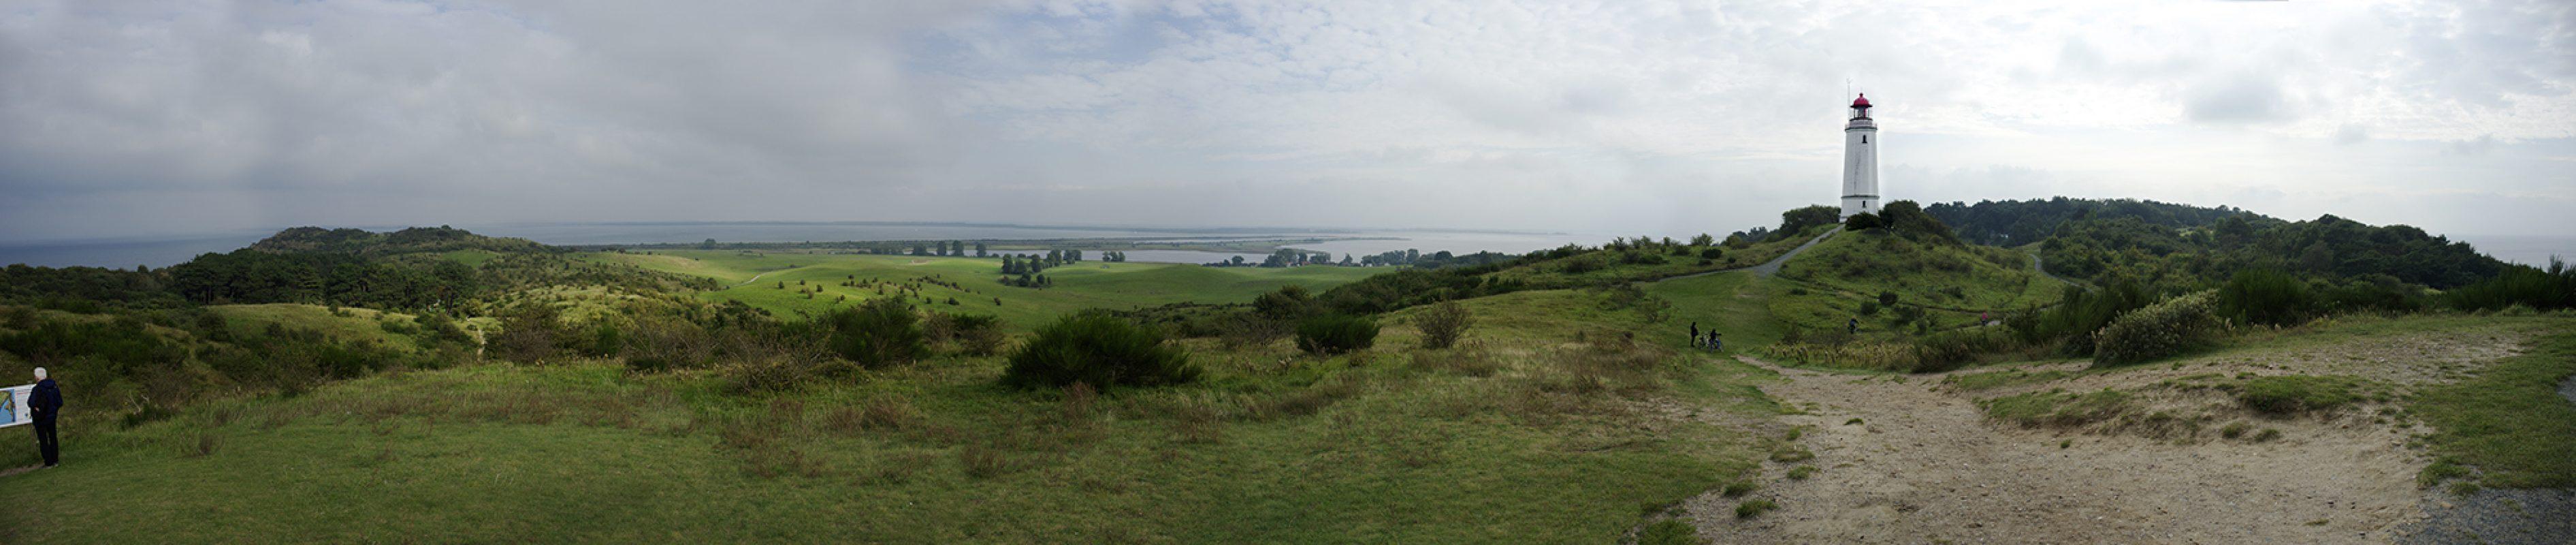 Hiddensee, Leuchtturm, Insel, Panorama